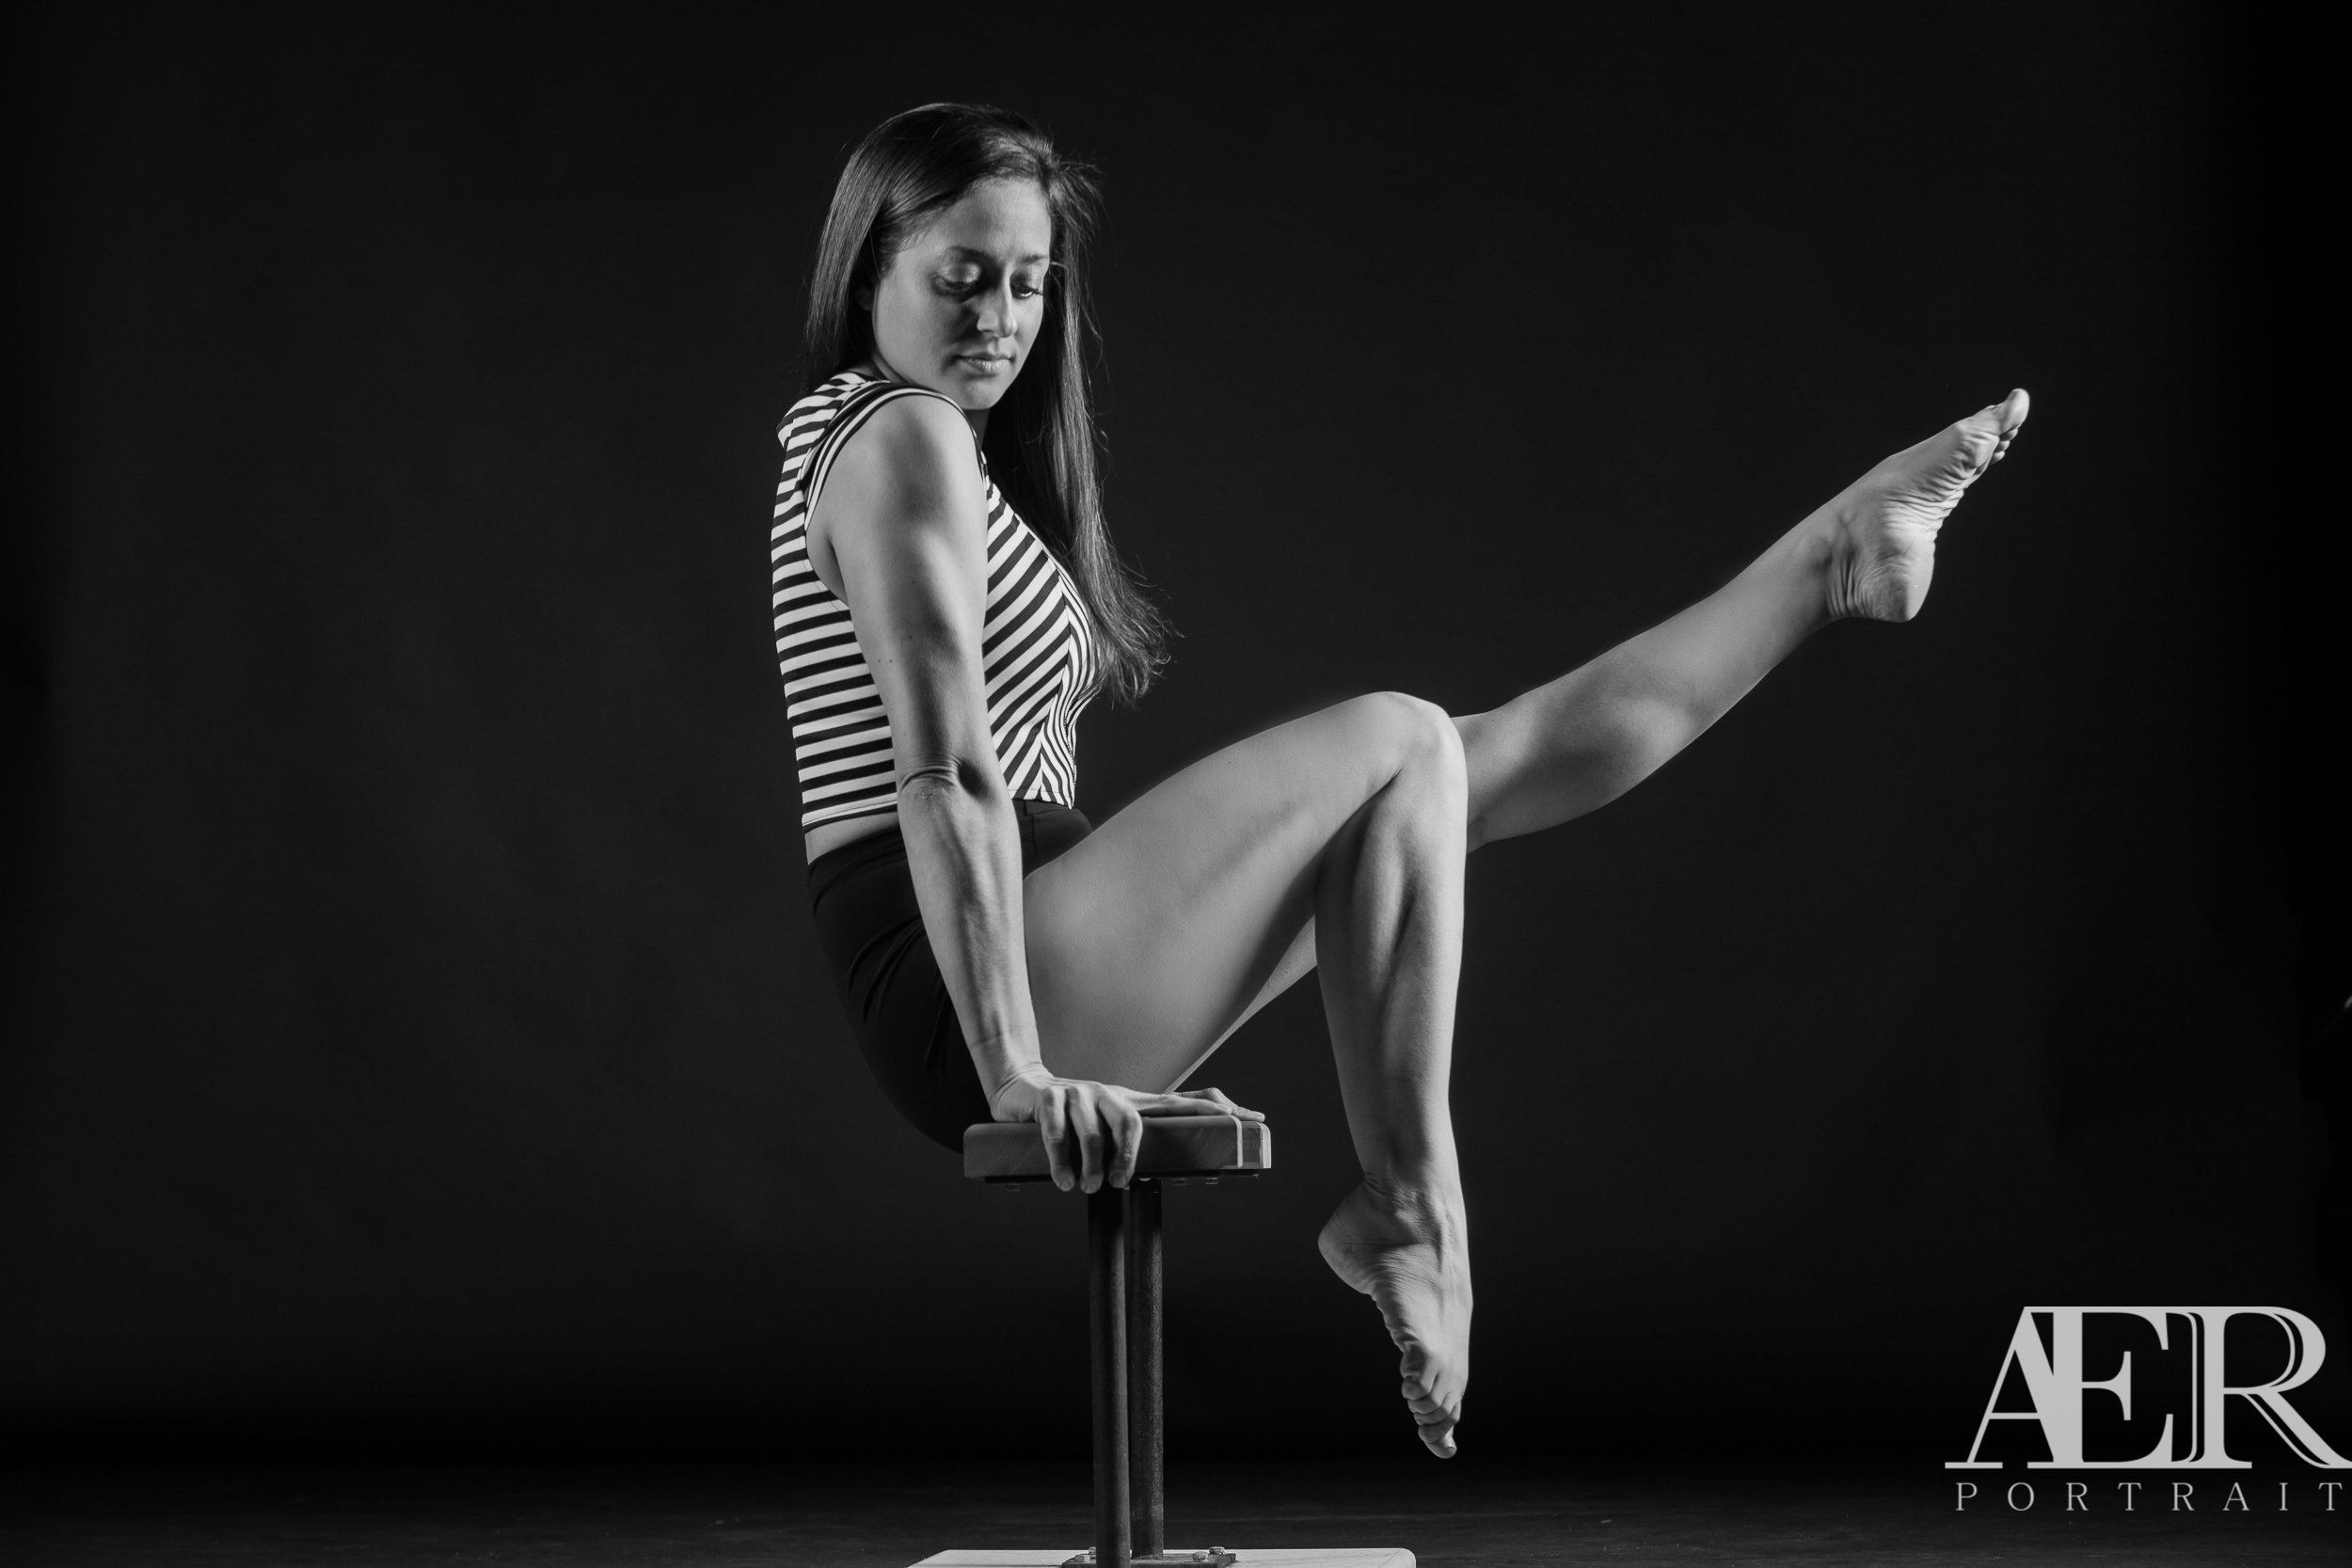 CirqueLouis 3 - Aer Portrait